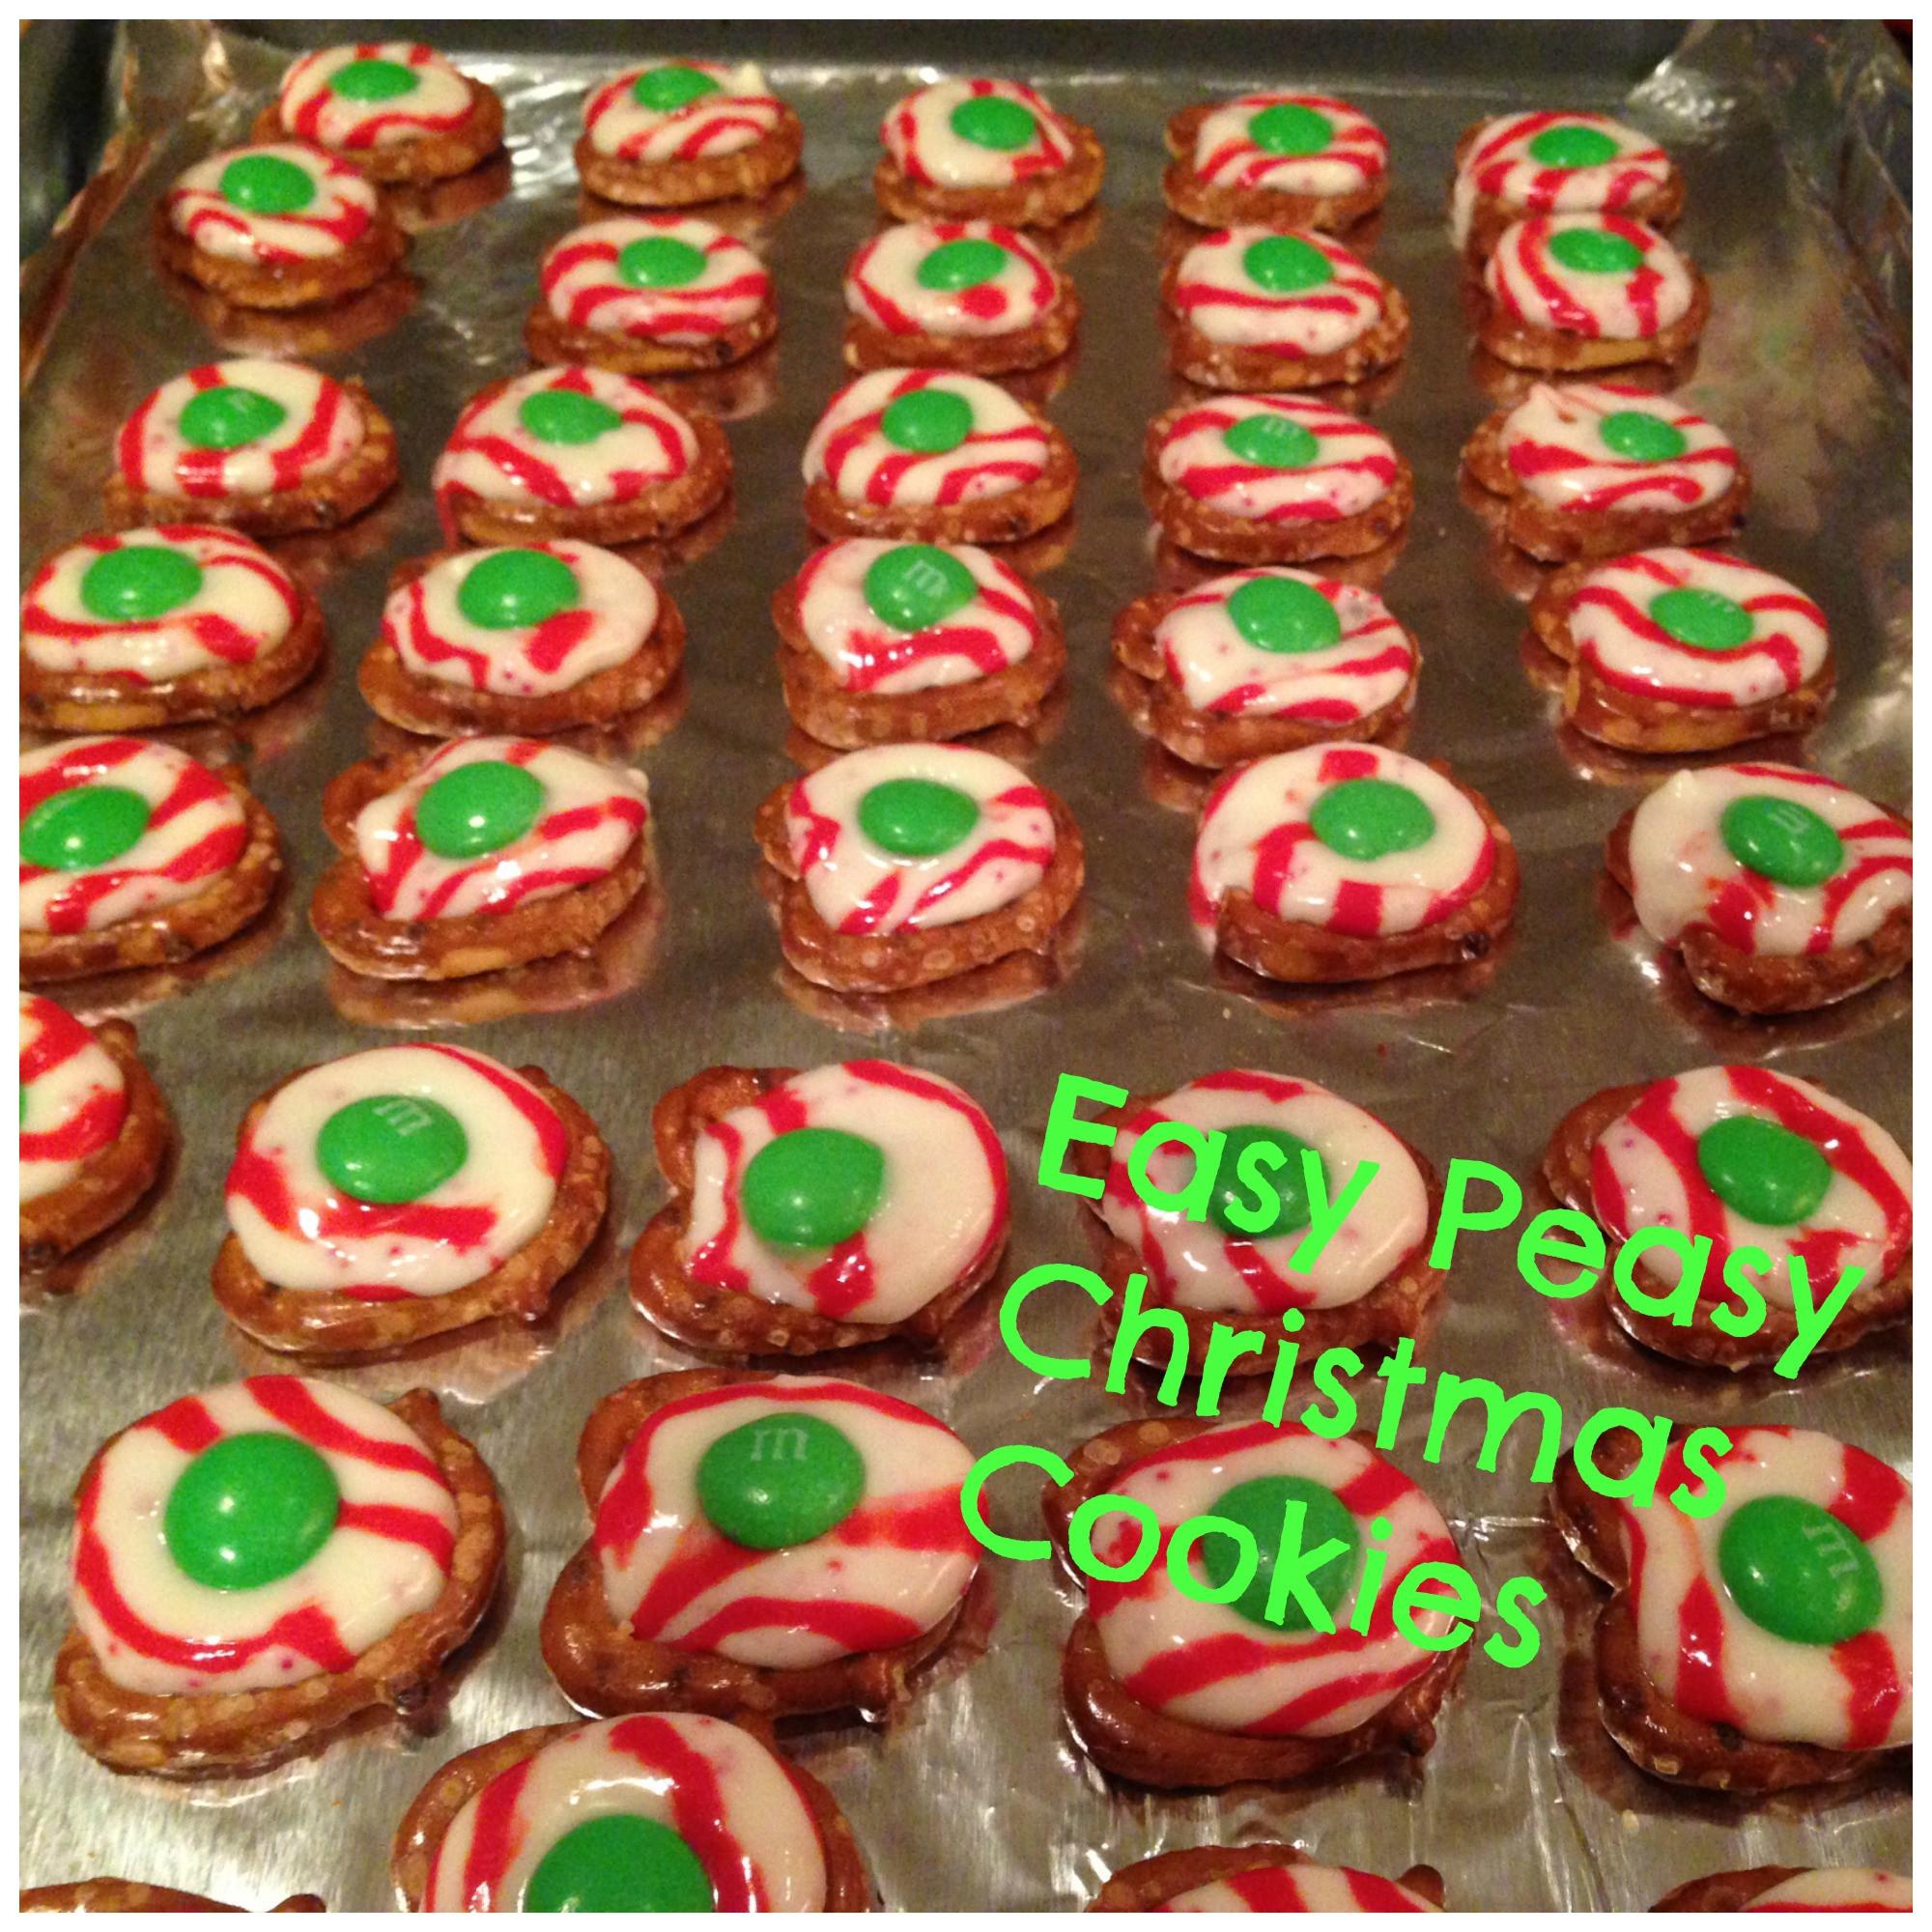 Easy Christmas Cookies  Easy Peasy Christmas Cookies Wrecking Routine